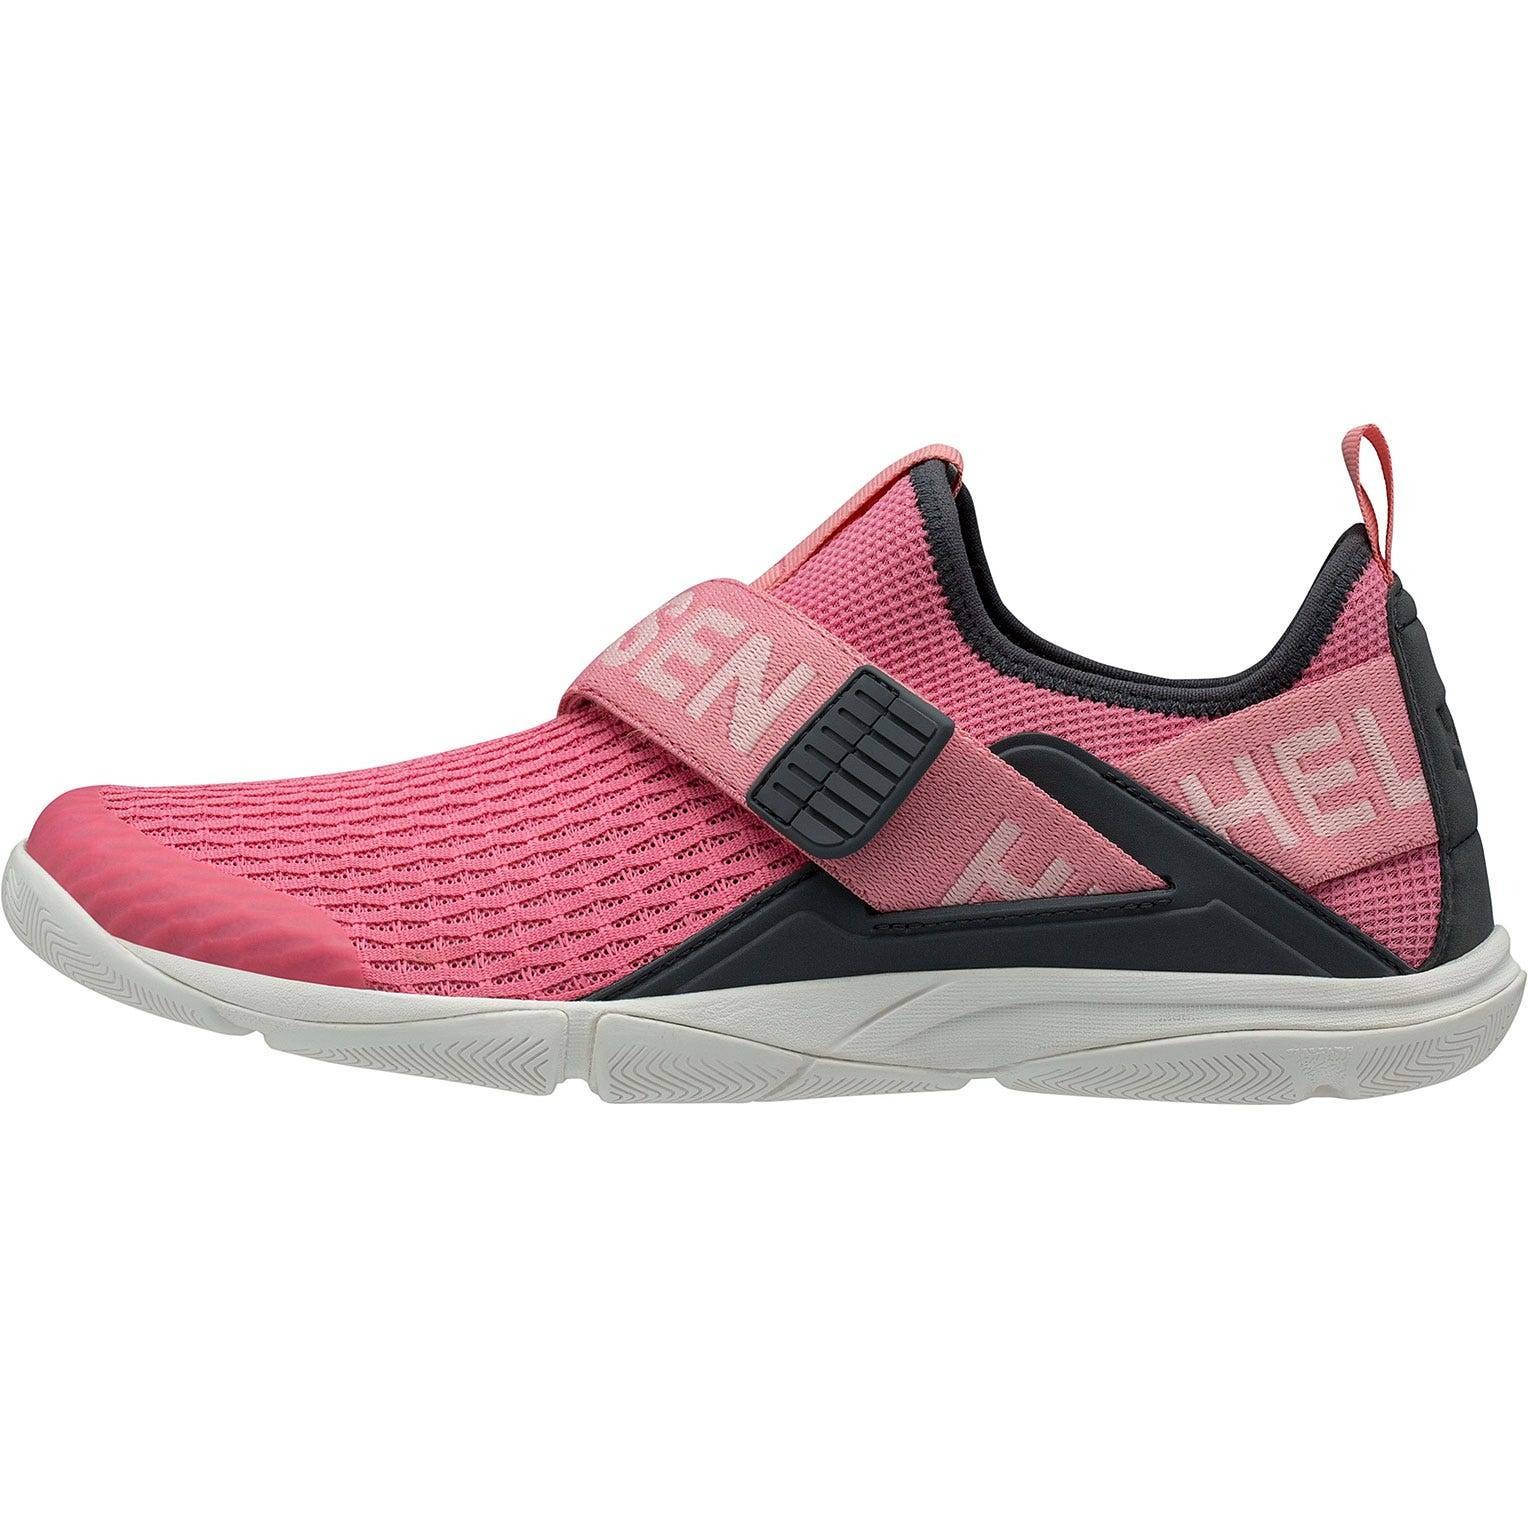 Helly Hansen W Hydromoc Slipon Shoe Womens Sailing Pink 40.5/9